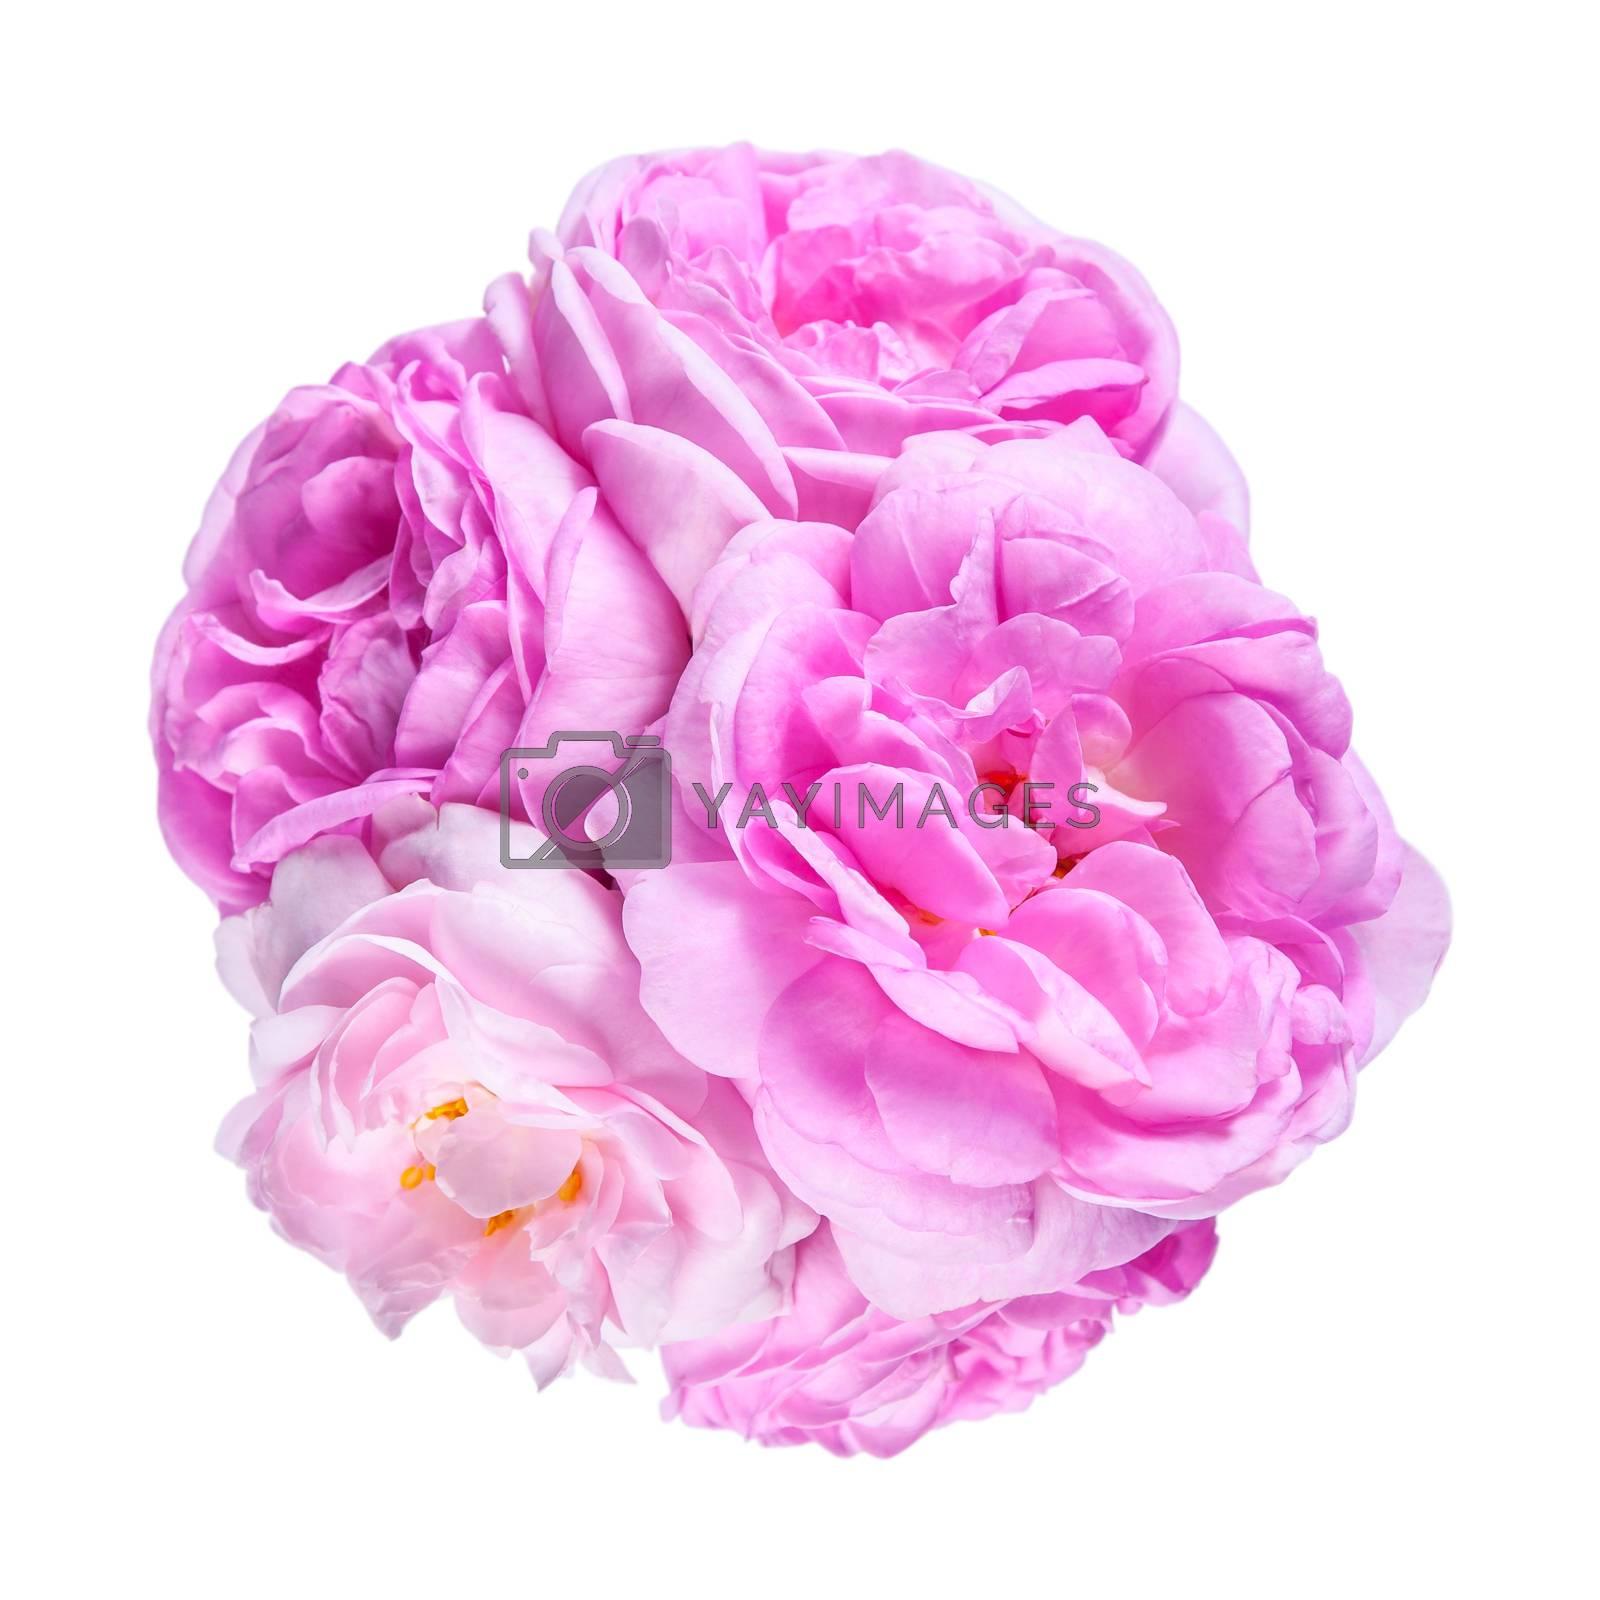 Tea rose pink flowers isolated on white backround